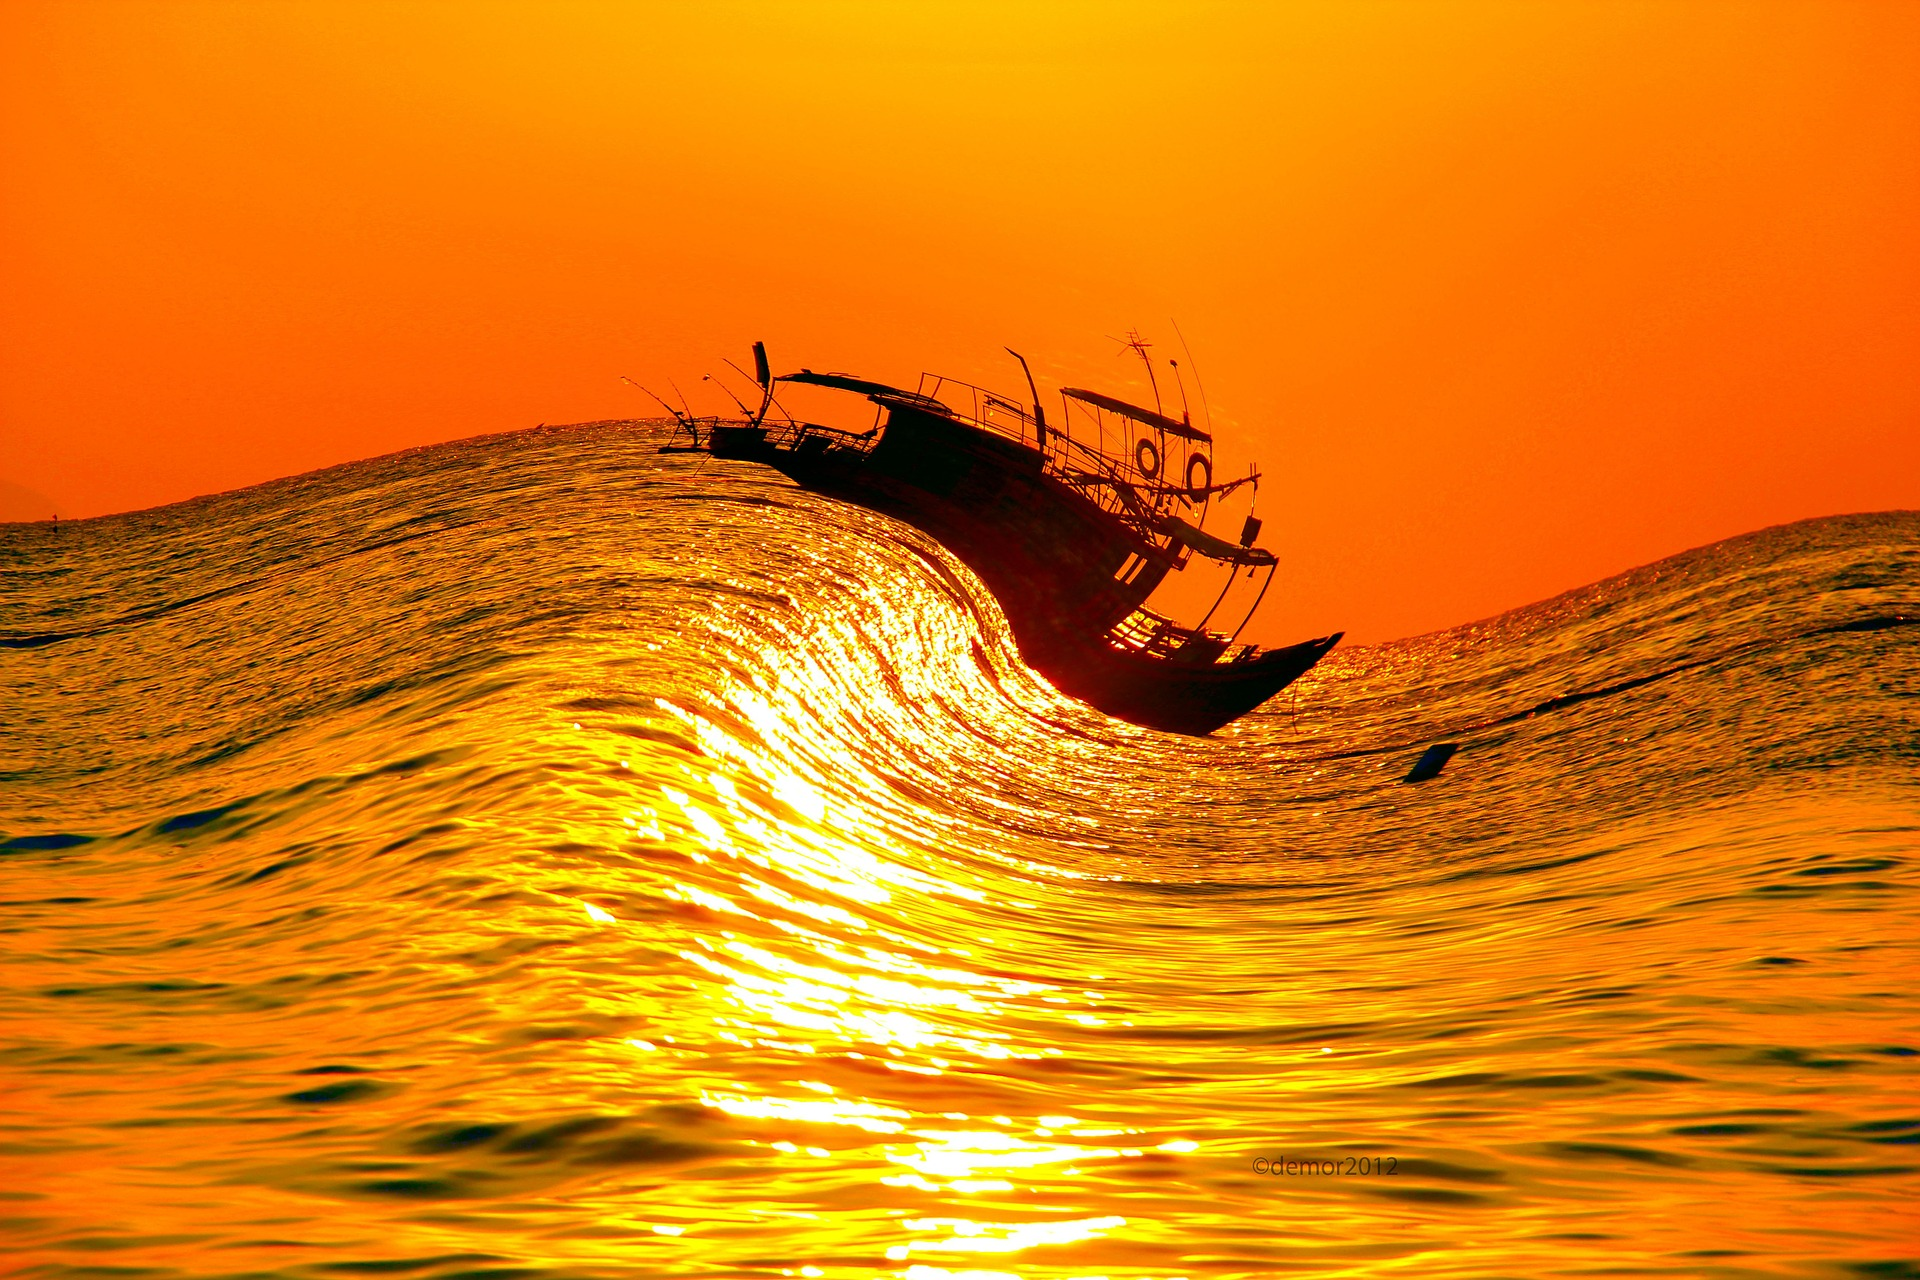 Kuka ohjaa laivaasi? Skorpionista merenkäyntiä, uhrautuva soturikuningas ja aurinkomysteerit